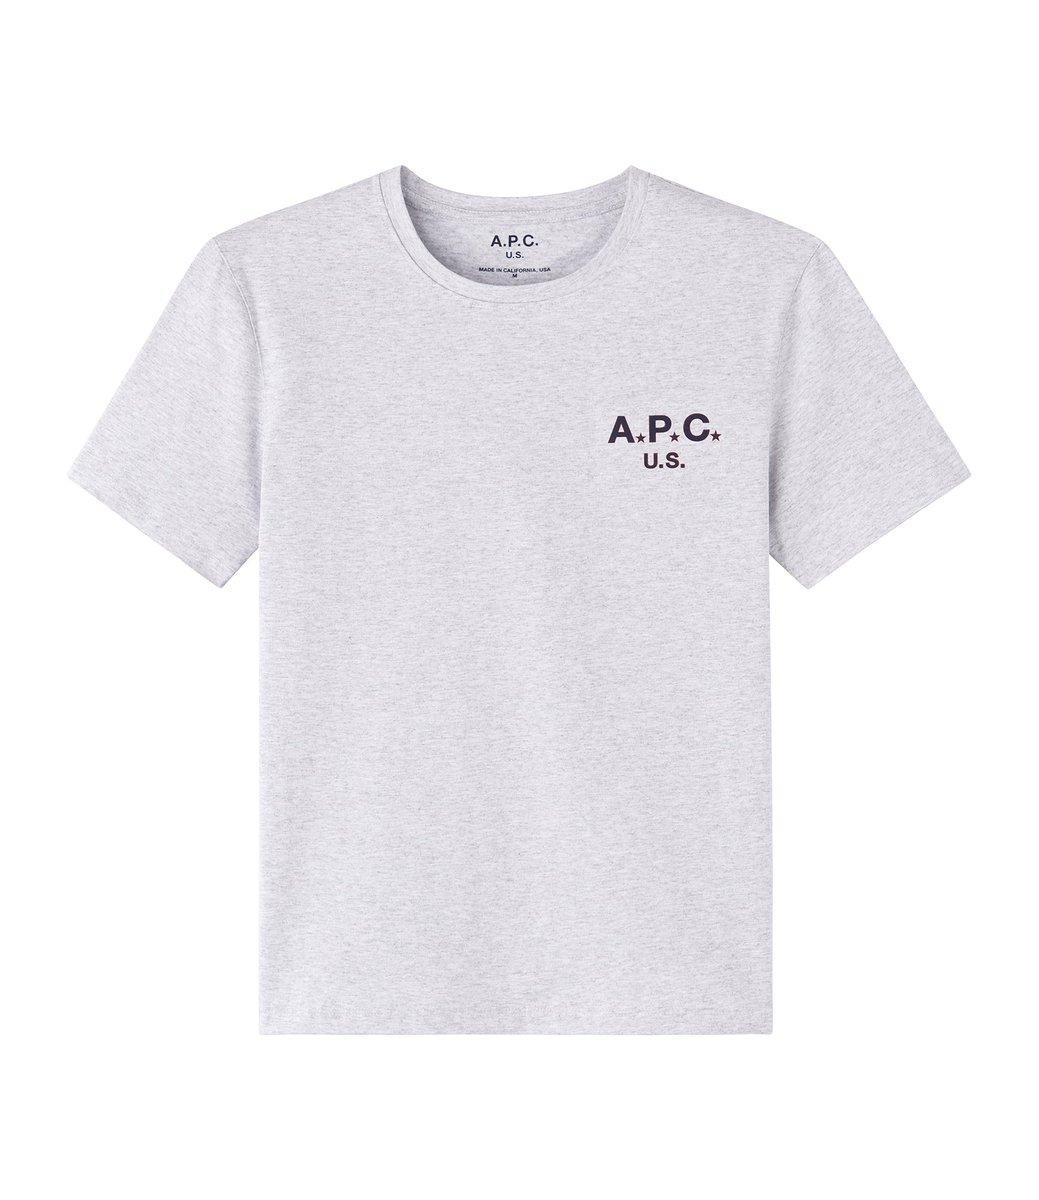 #APCUS コレクション Flag Tシャツ https://t.co/pRHhxCX4fh https://t.co/oSsnAM4T18